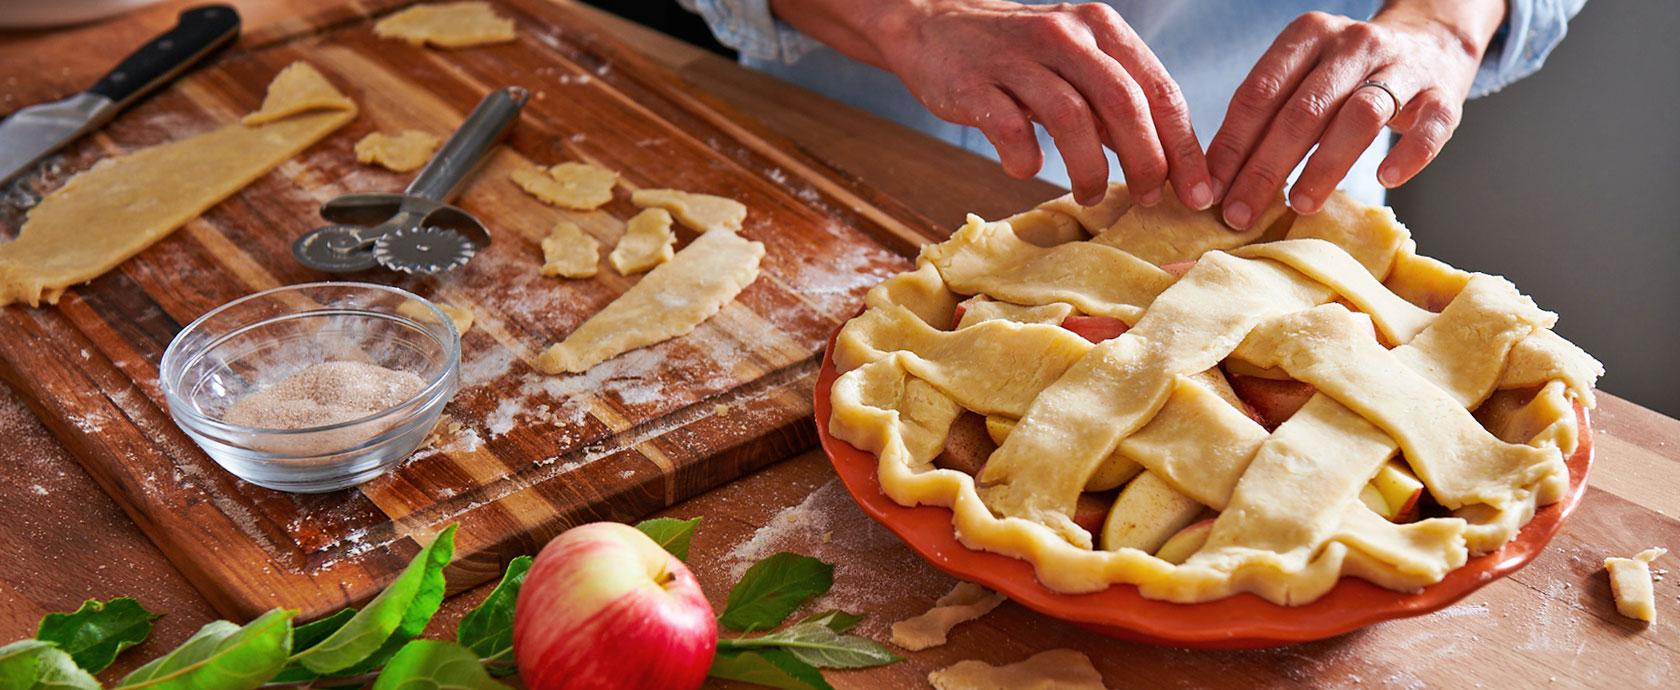 Chef making fresh apple pie